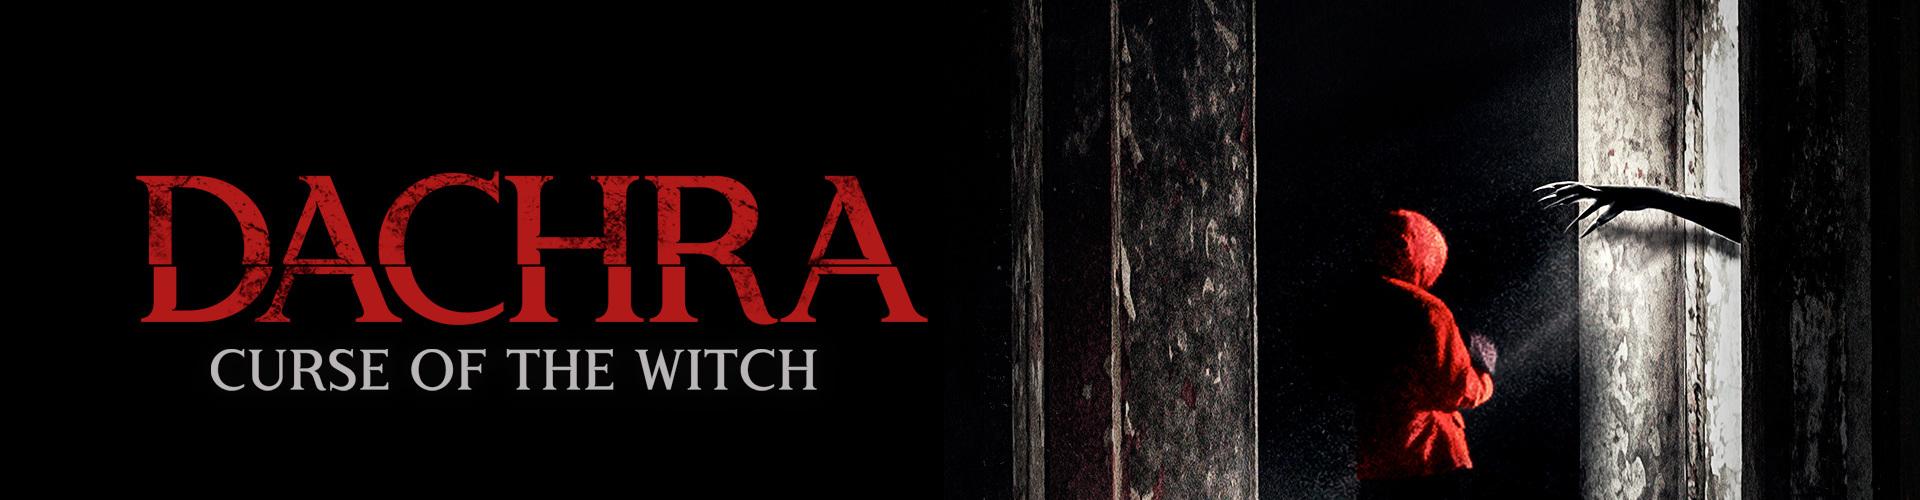 Dachra – Blue Finch Films